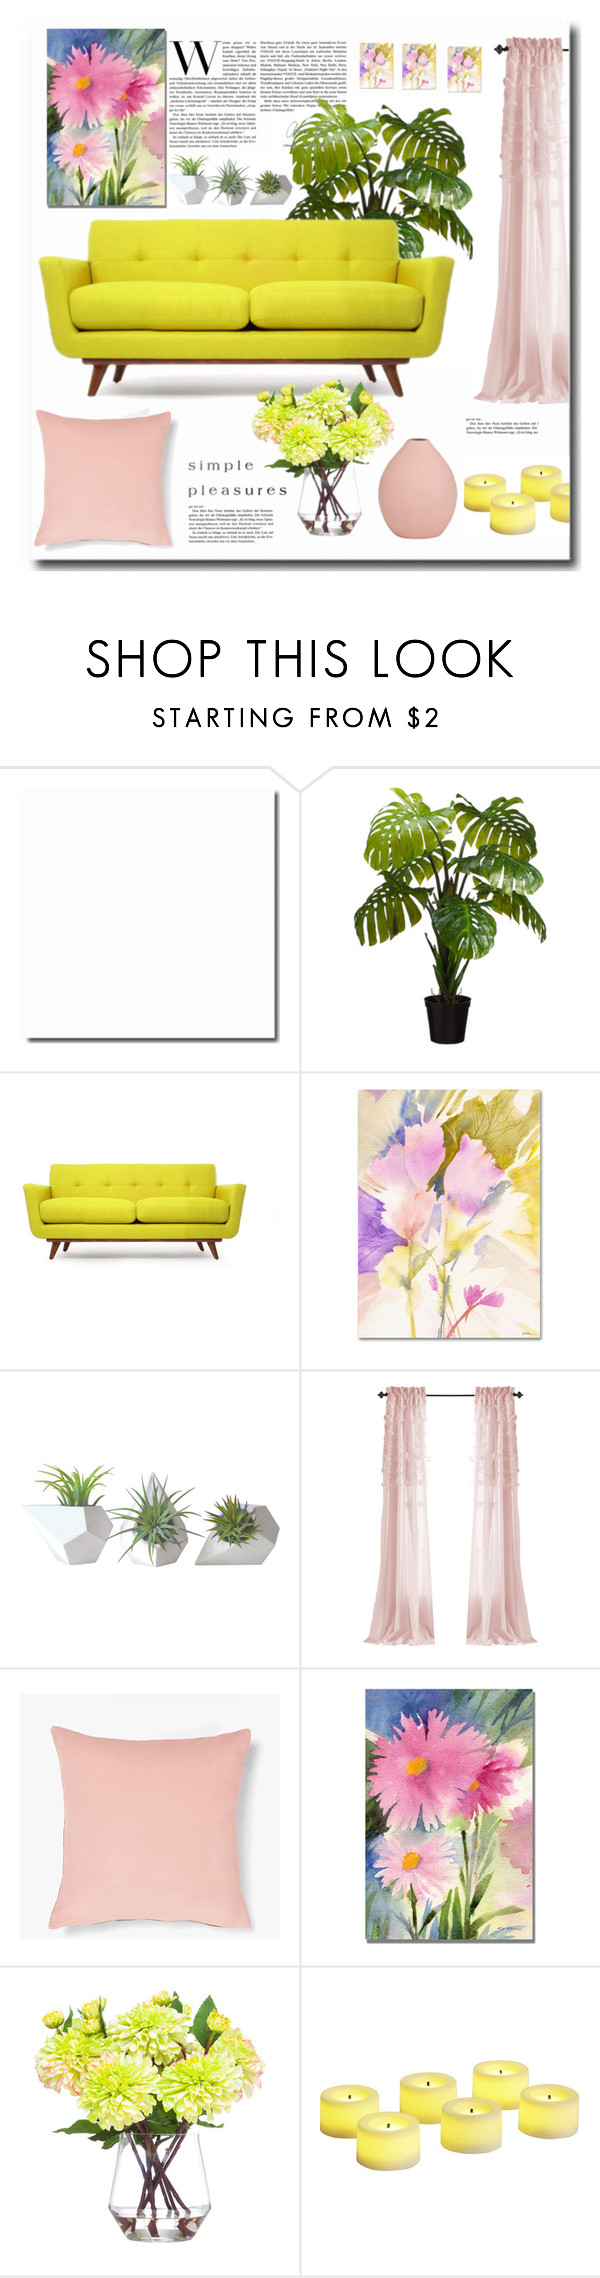 """Yellow"" by jana-masarovicova ❤ liked on Polyvore featuring interior, interiors, interior design, home, home decor, interior decorating, Thrive, Trademark Fine Art, Dot & Bo and Lux-Art Silks"